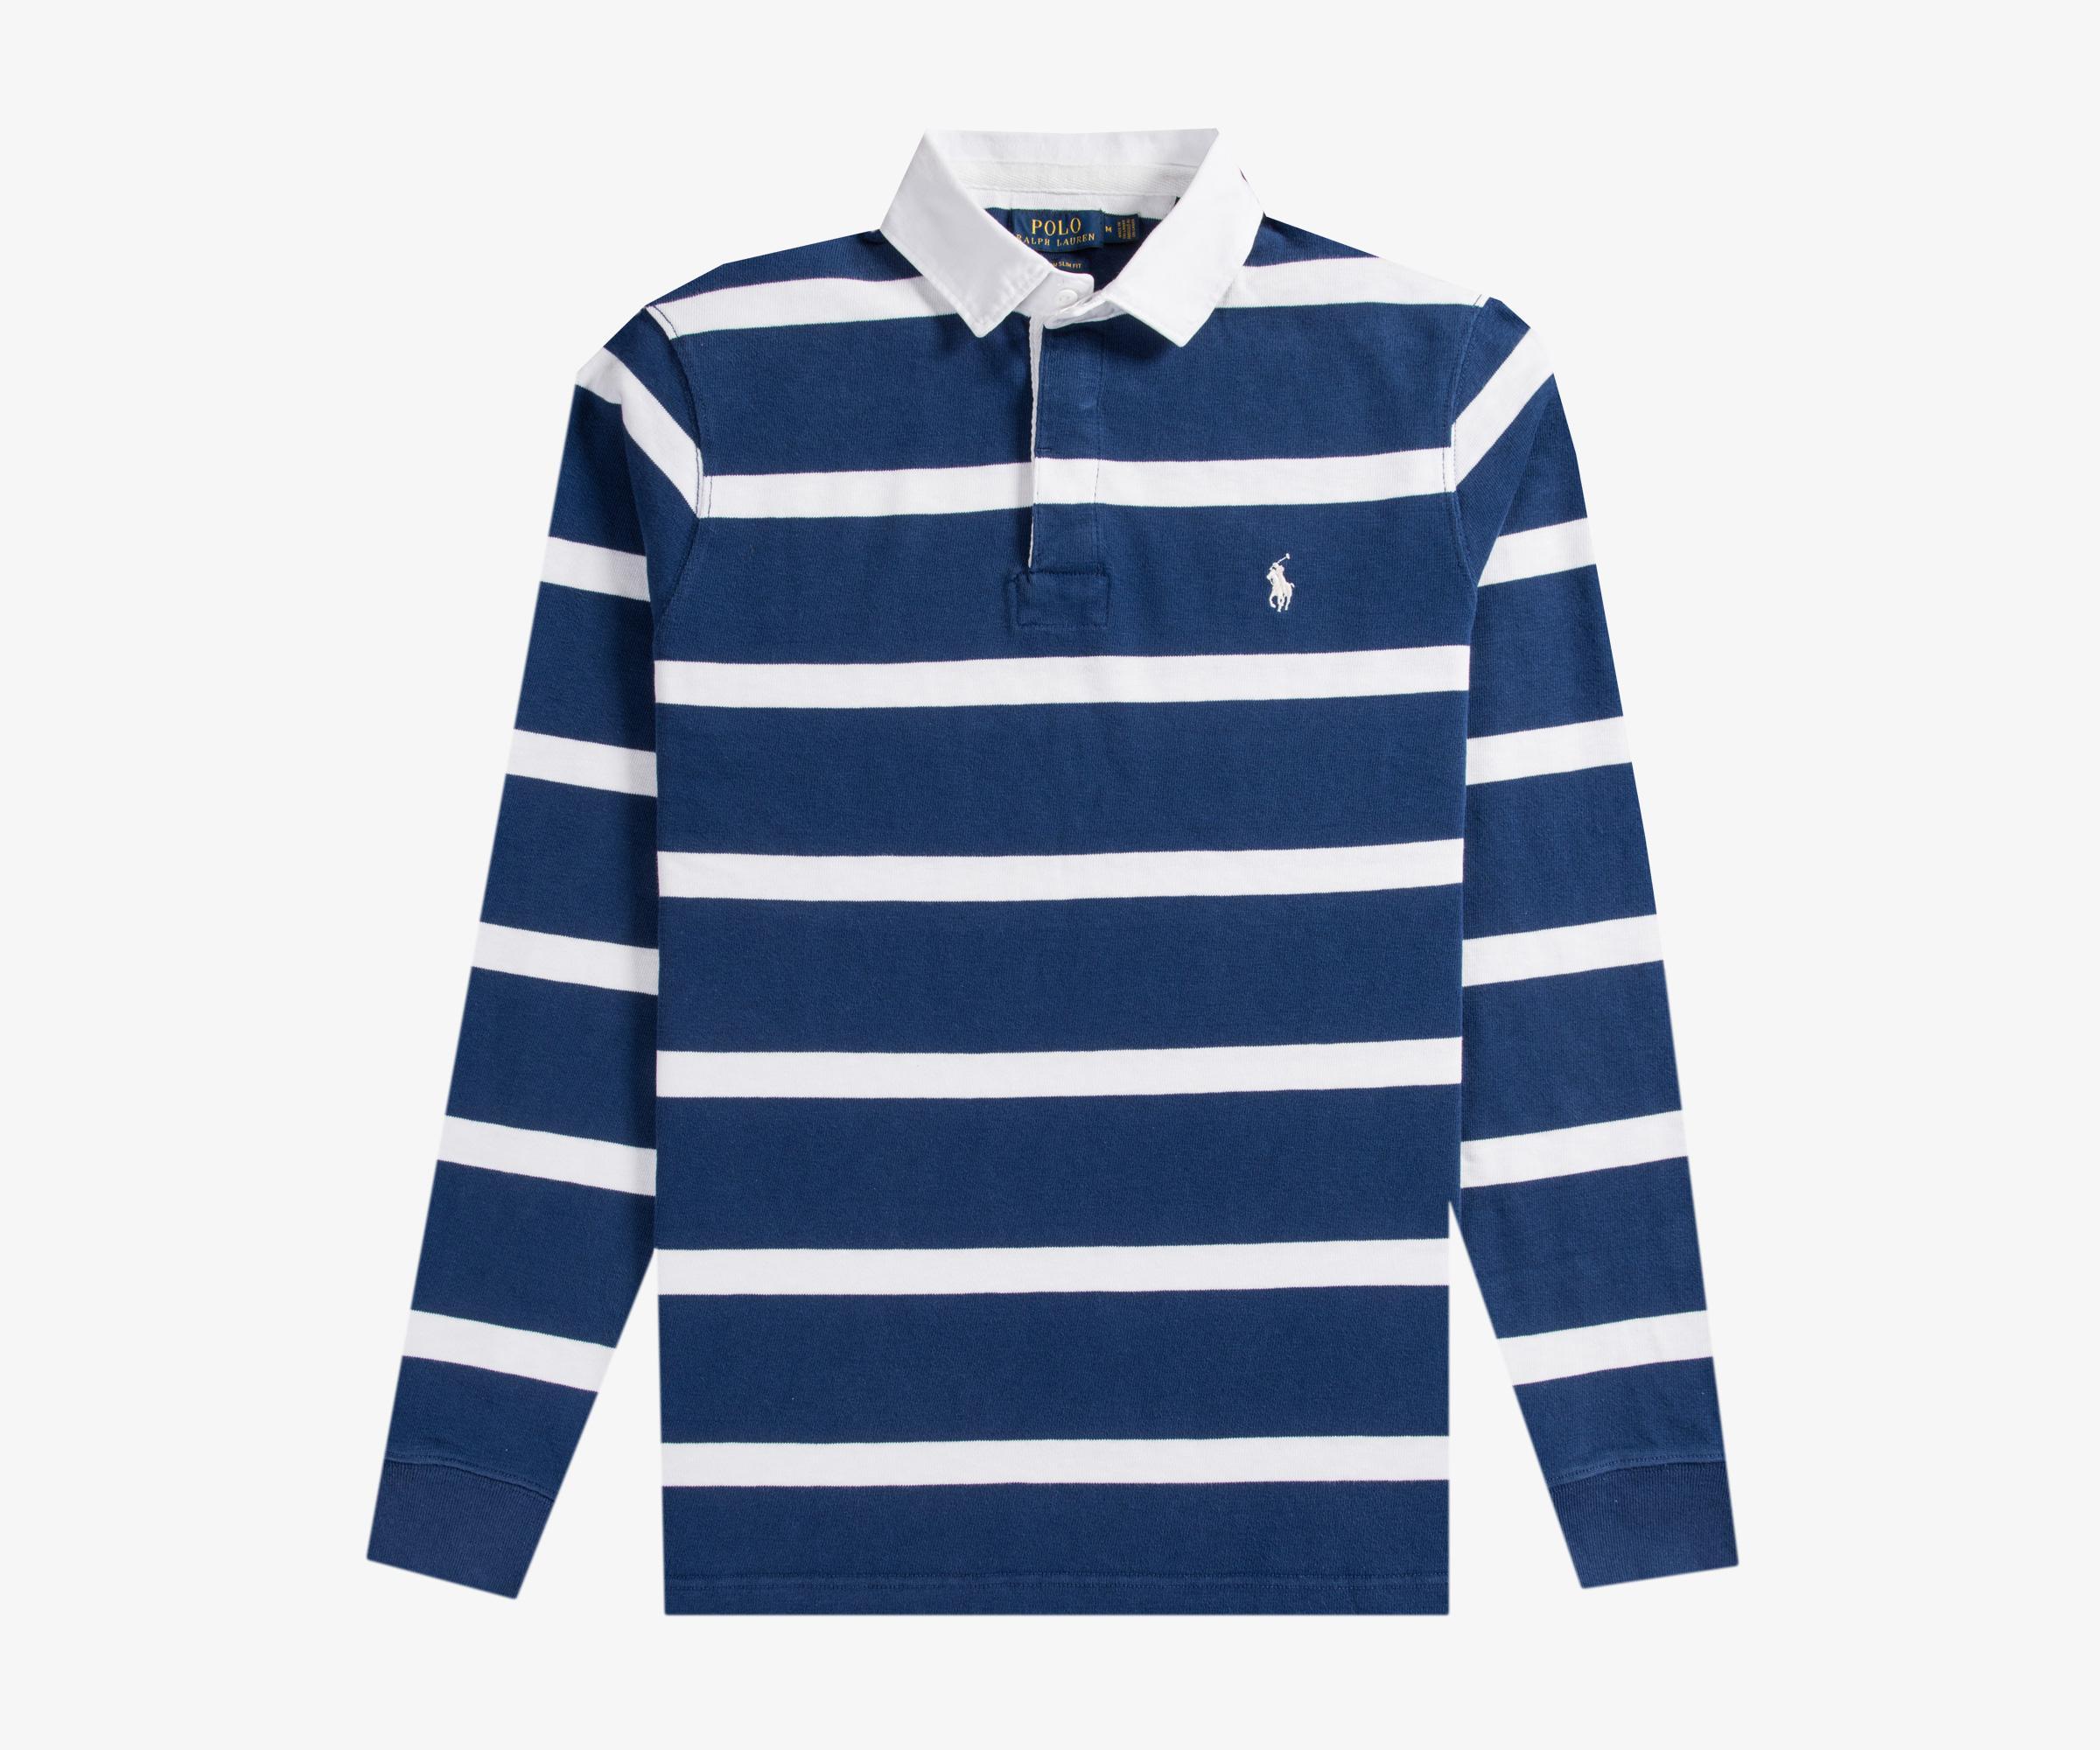 6537ea345 ... low cost lyst polo ralph lauren bar stripe rugby shirt navy white in  blue aea3a 5e1ec